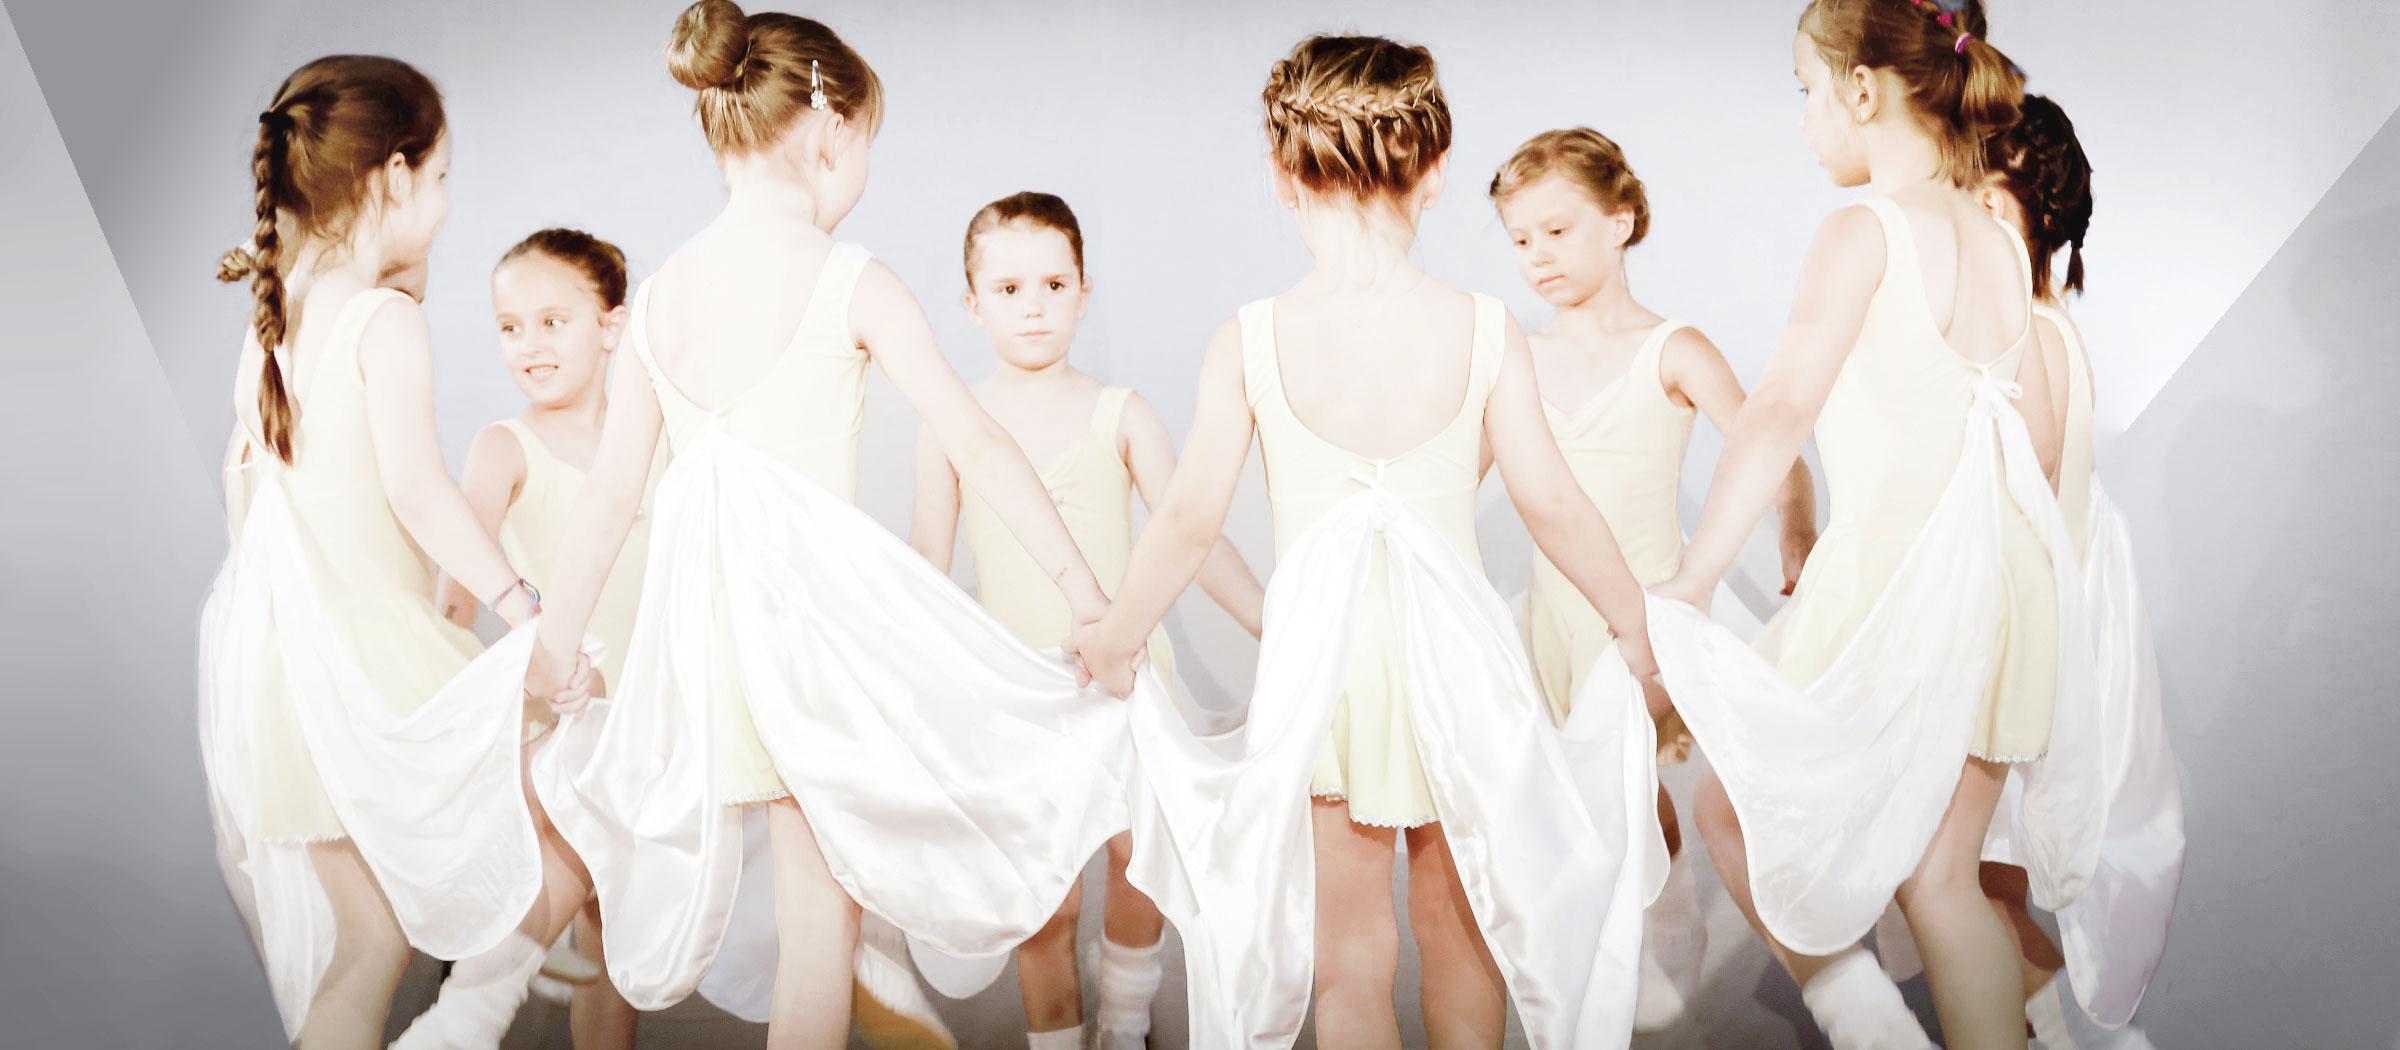 DANCE-4-FUN_SLIDER-02_KIDS